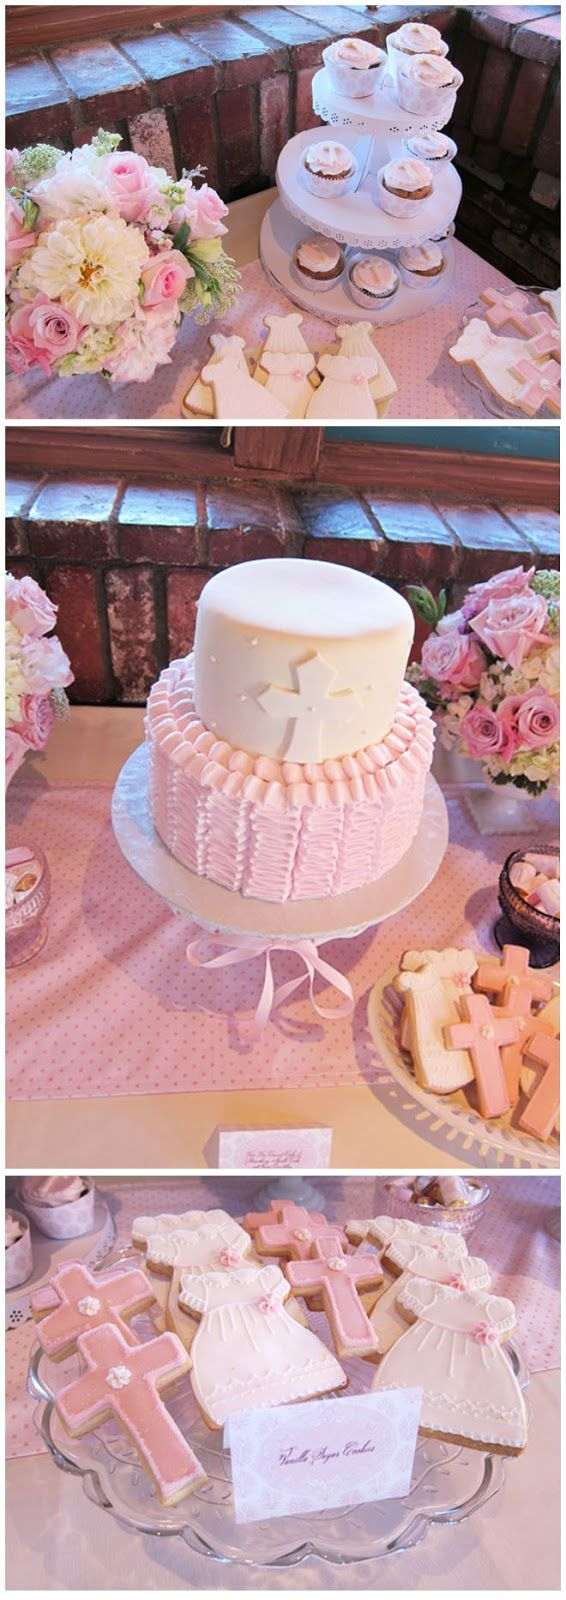 Baby girl baptism or christening celebration dessert table. www.greenbeansieink.com